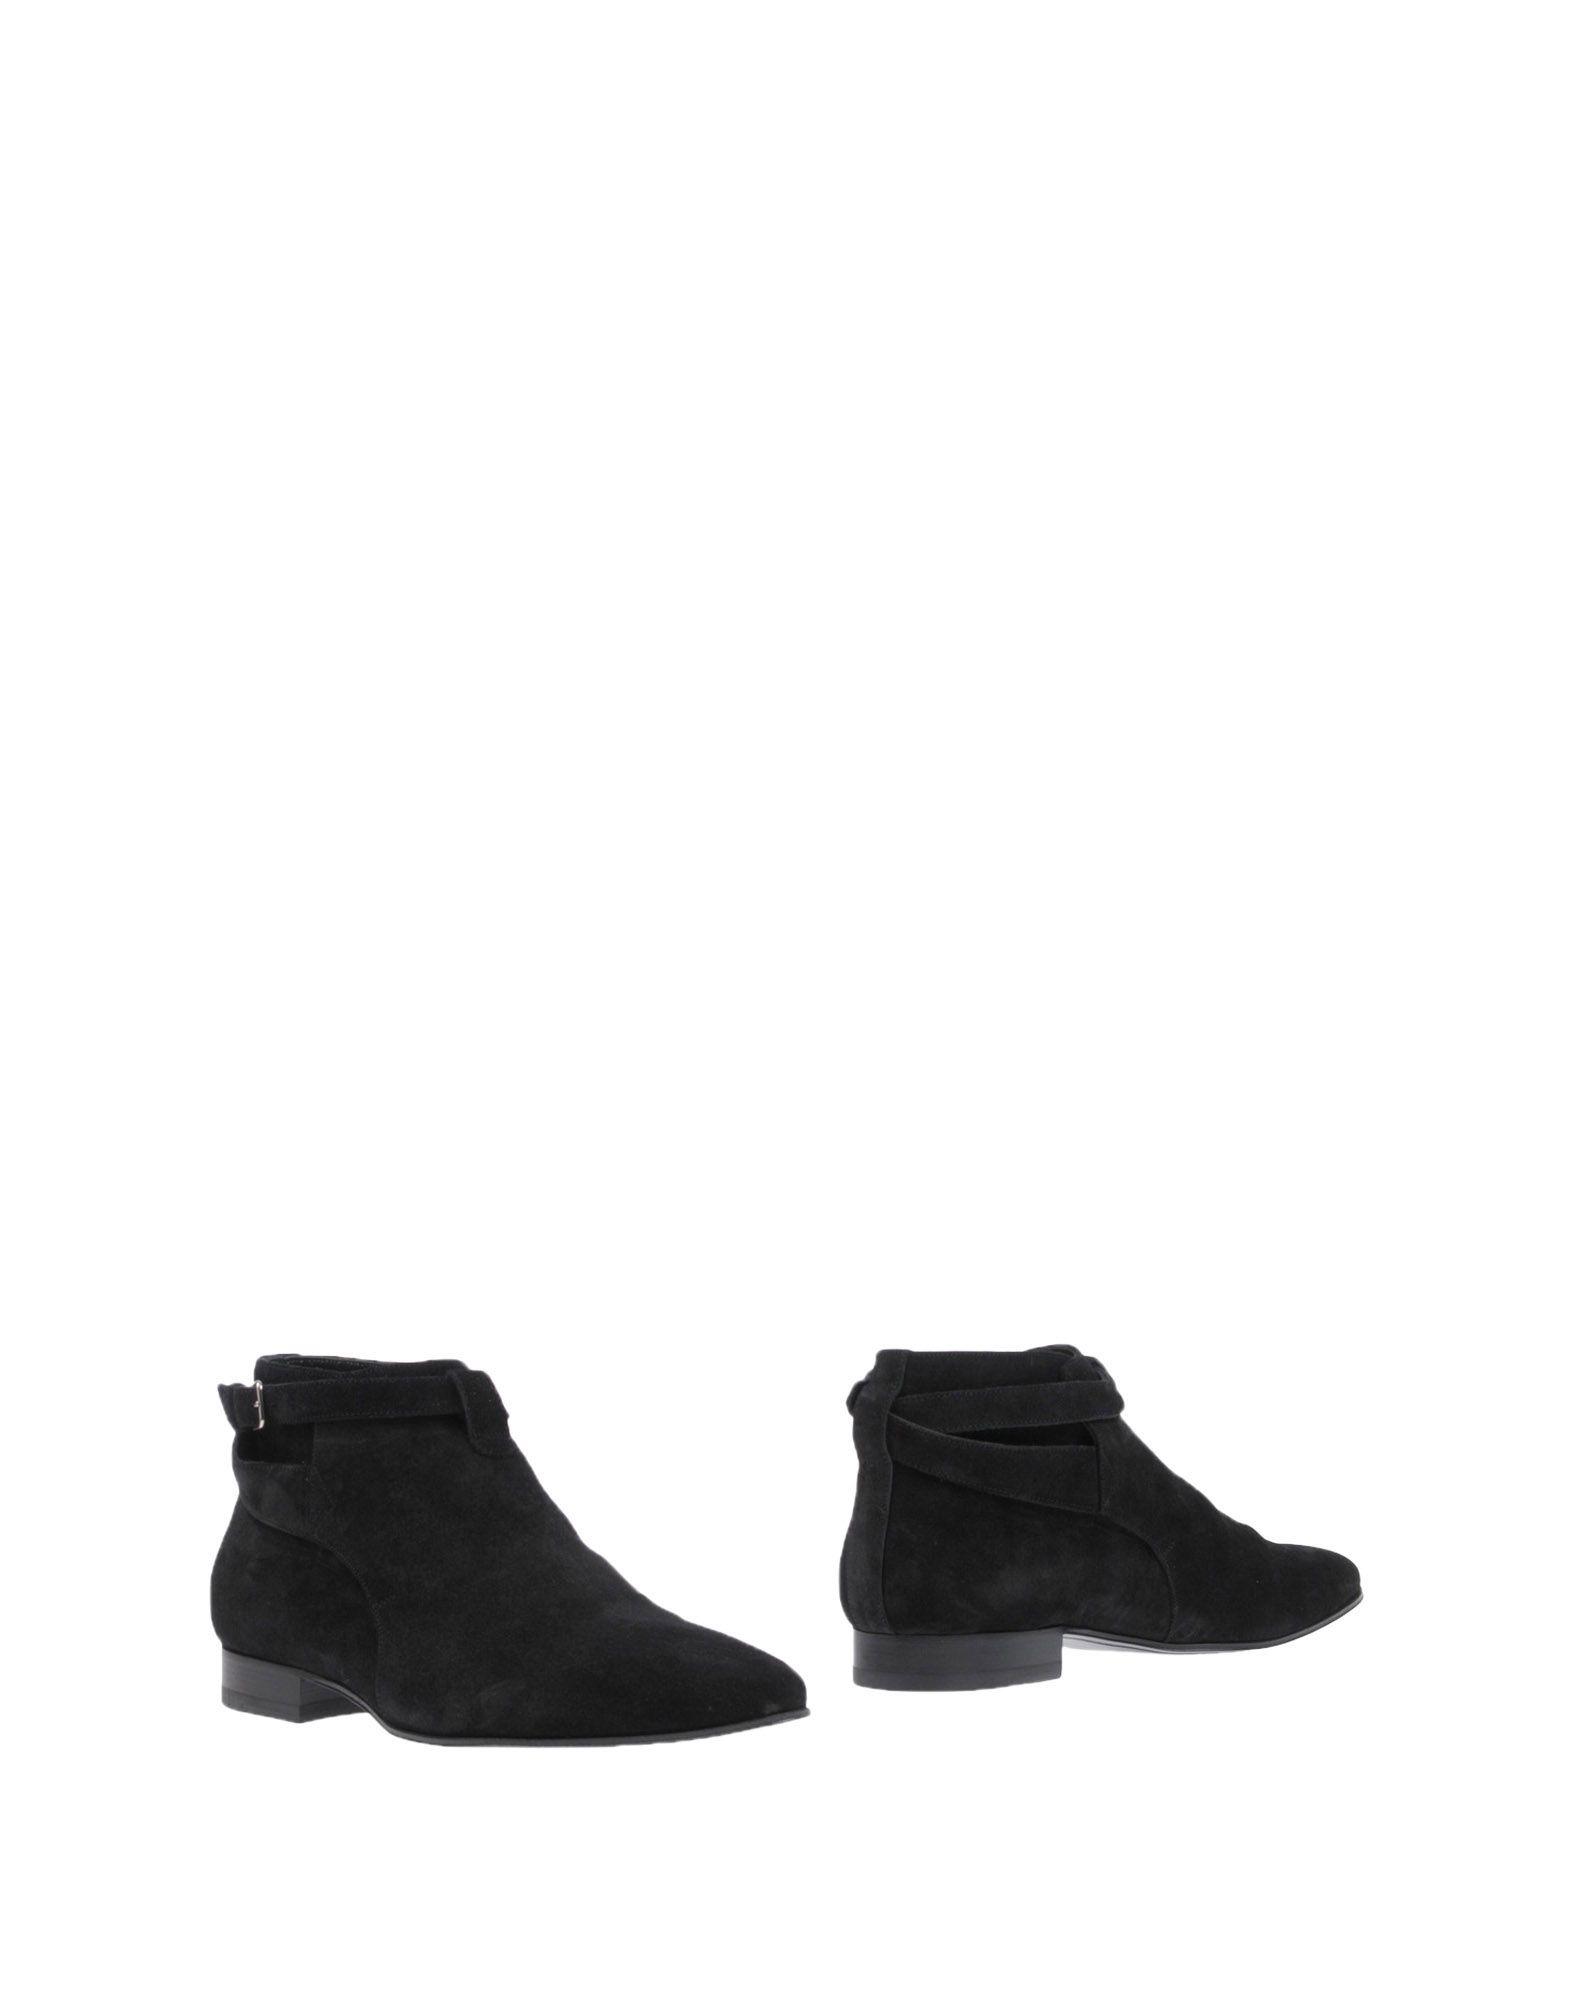 Saint Laurent Stiefelette Qualität Herren  11364615UH Gute Qualität Stiefelette beliebte Schuhe 5d8a87